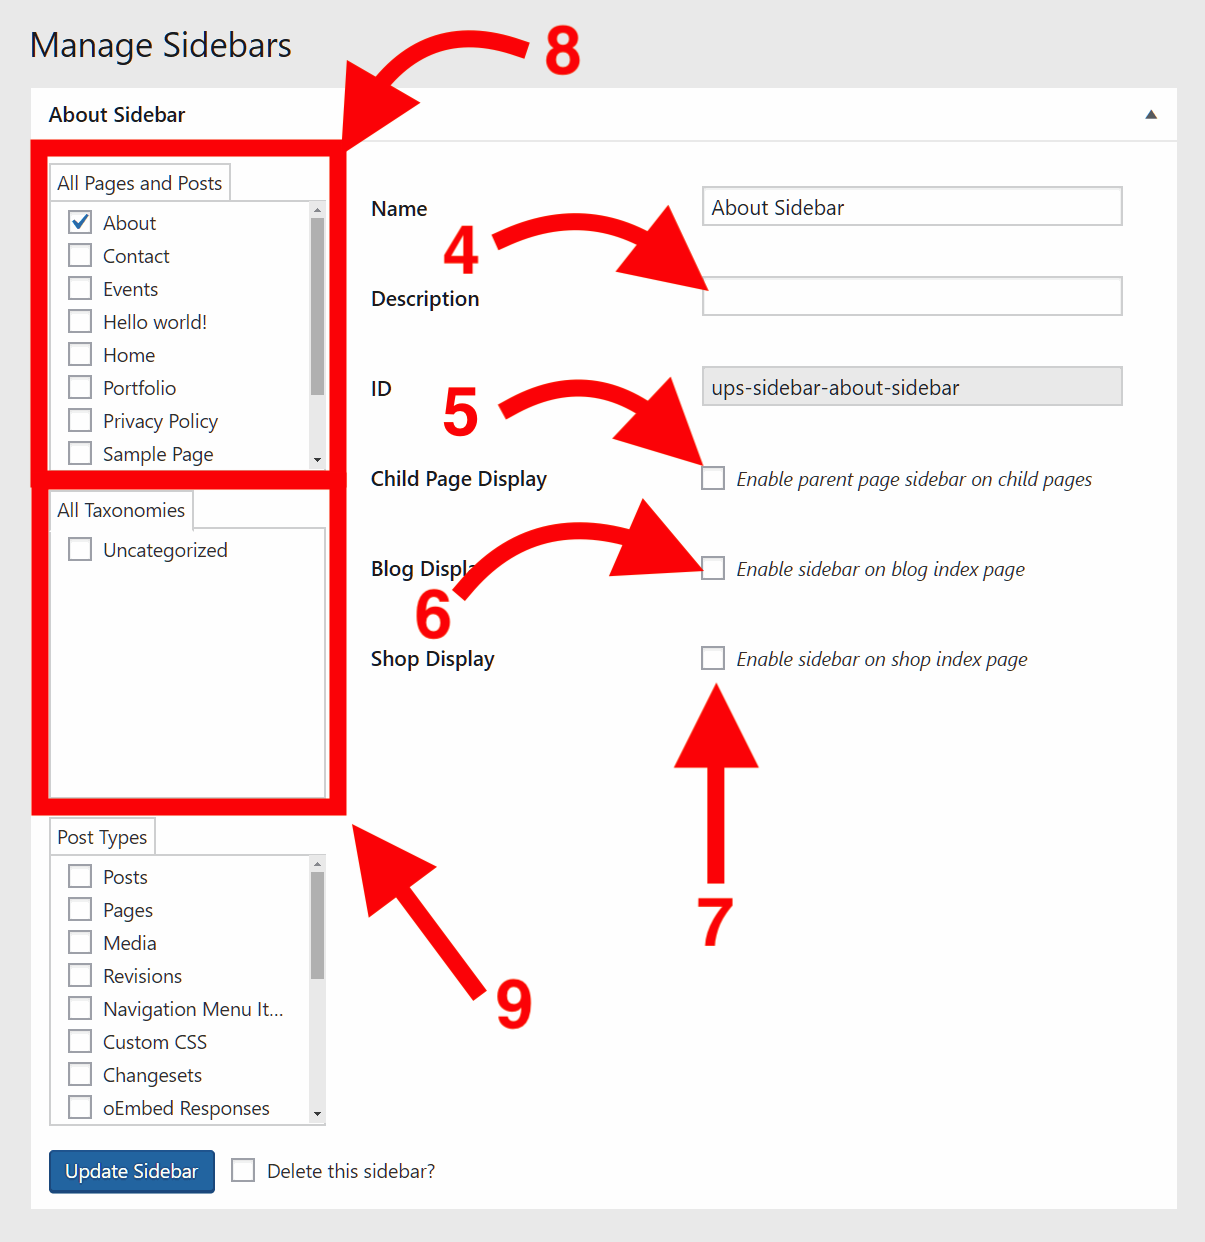 Manage Sidebars